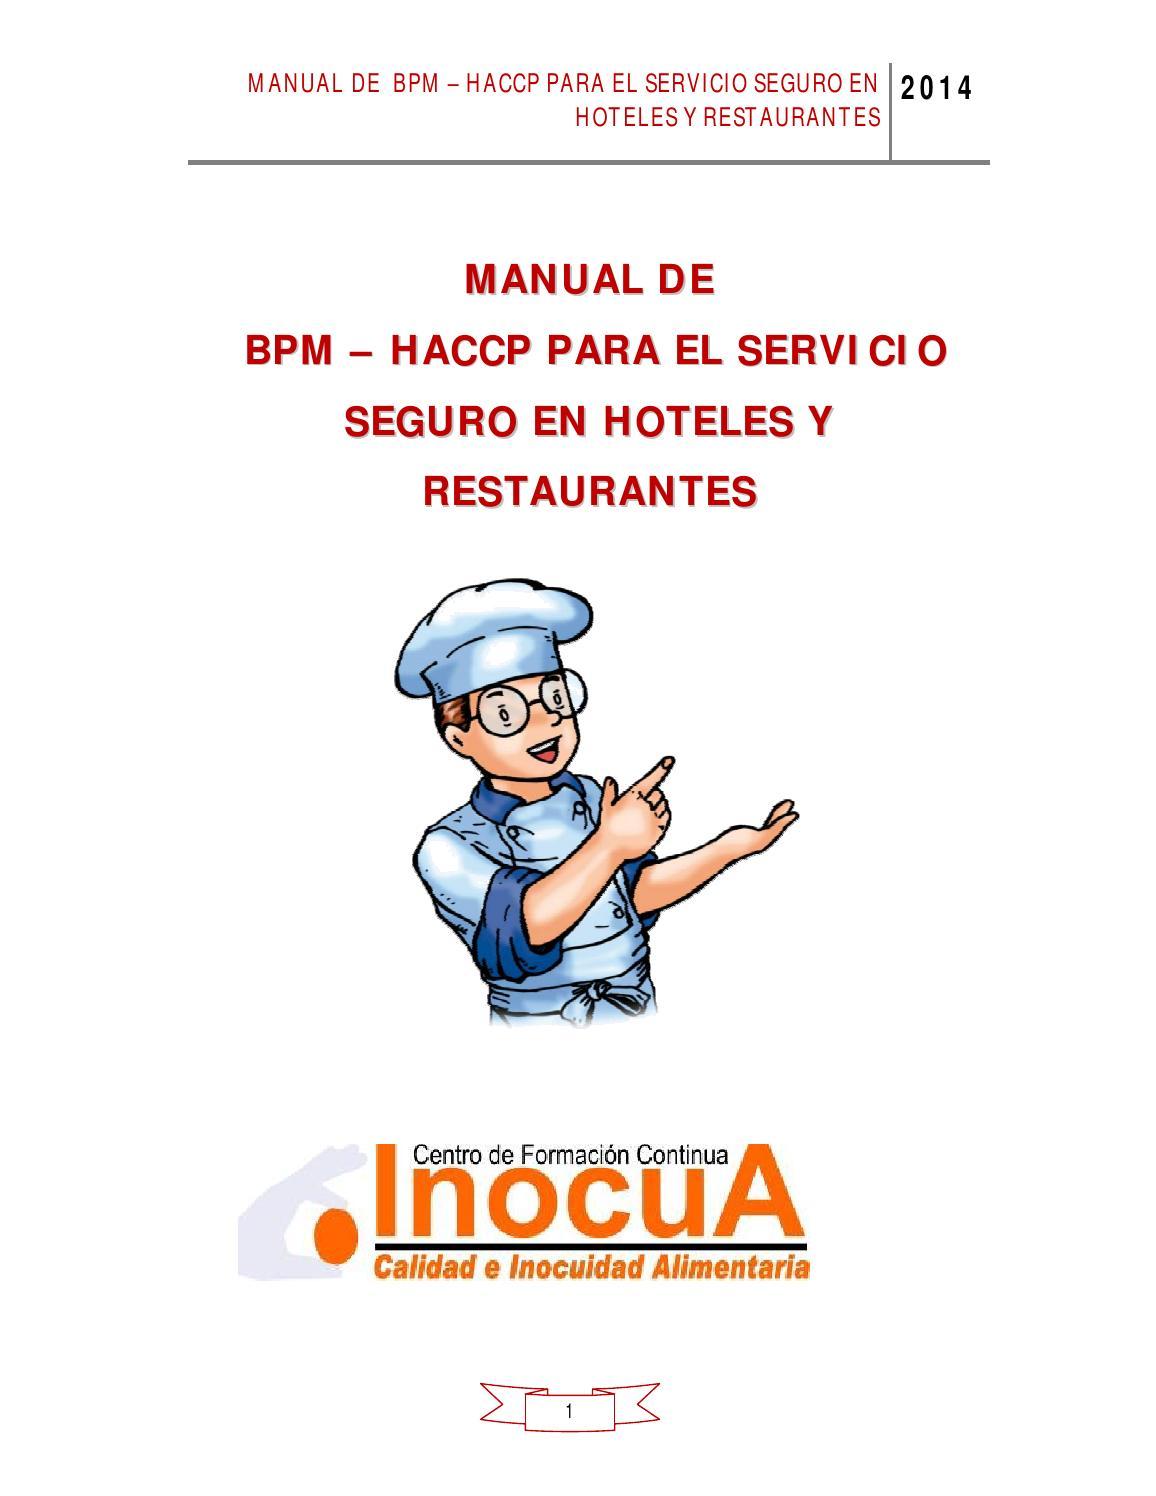 Manual bpm en restaurantes by inocua peru issuu for Manual de restaurante pdf